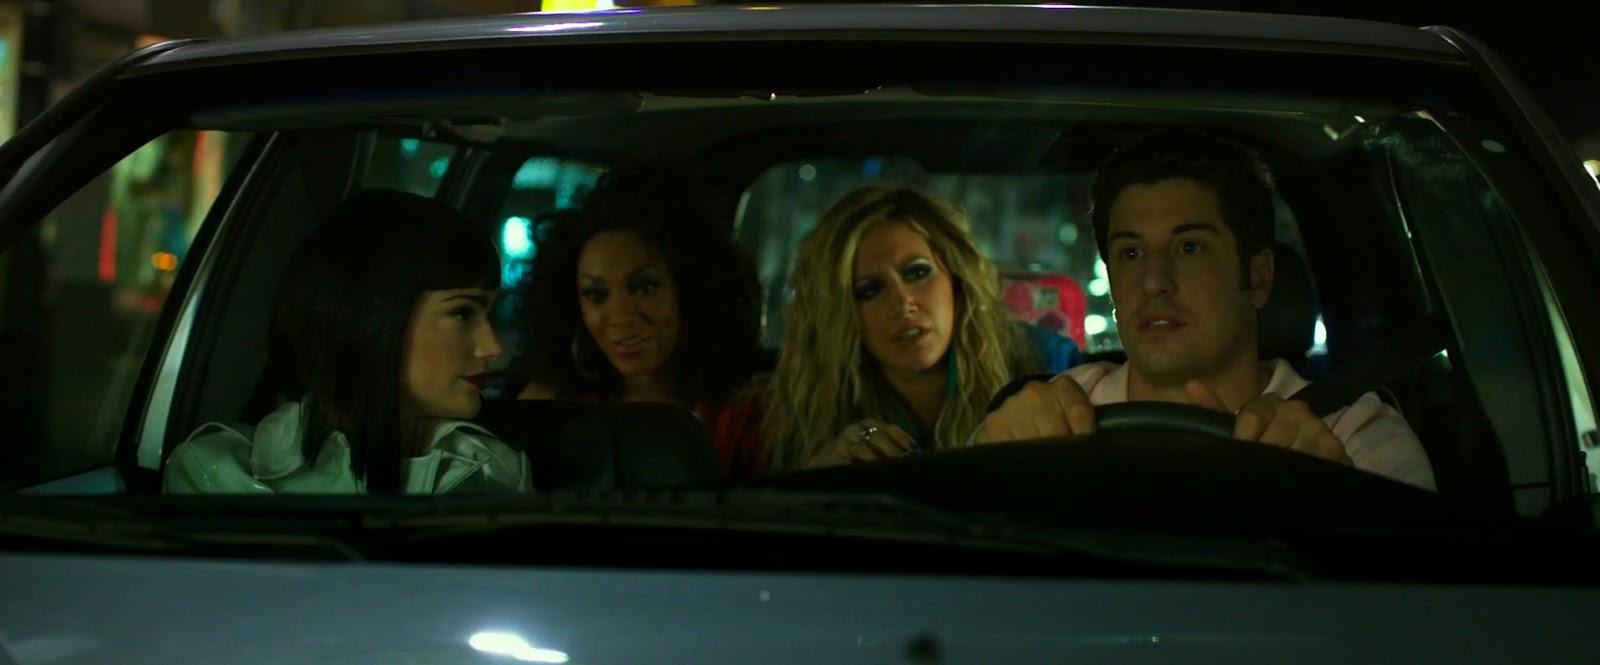 Un Chofer en Apuros (2016) 1080p Latino - Ingles captura 2